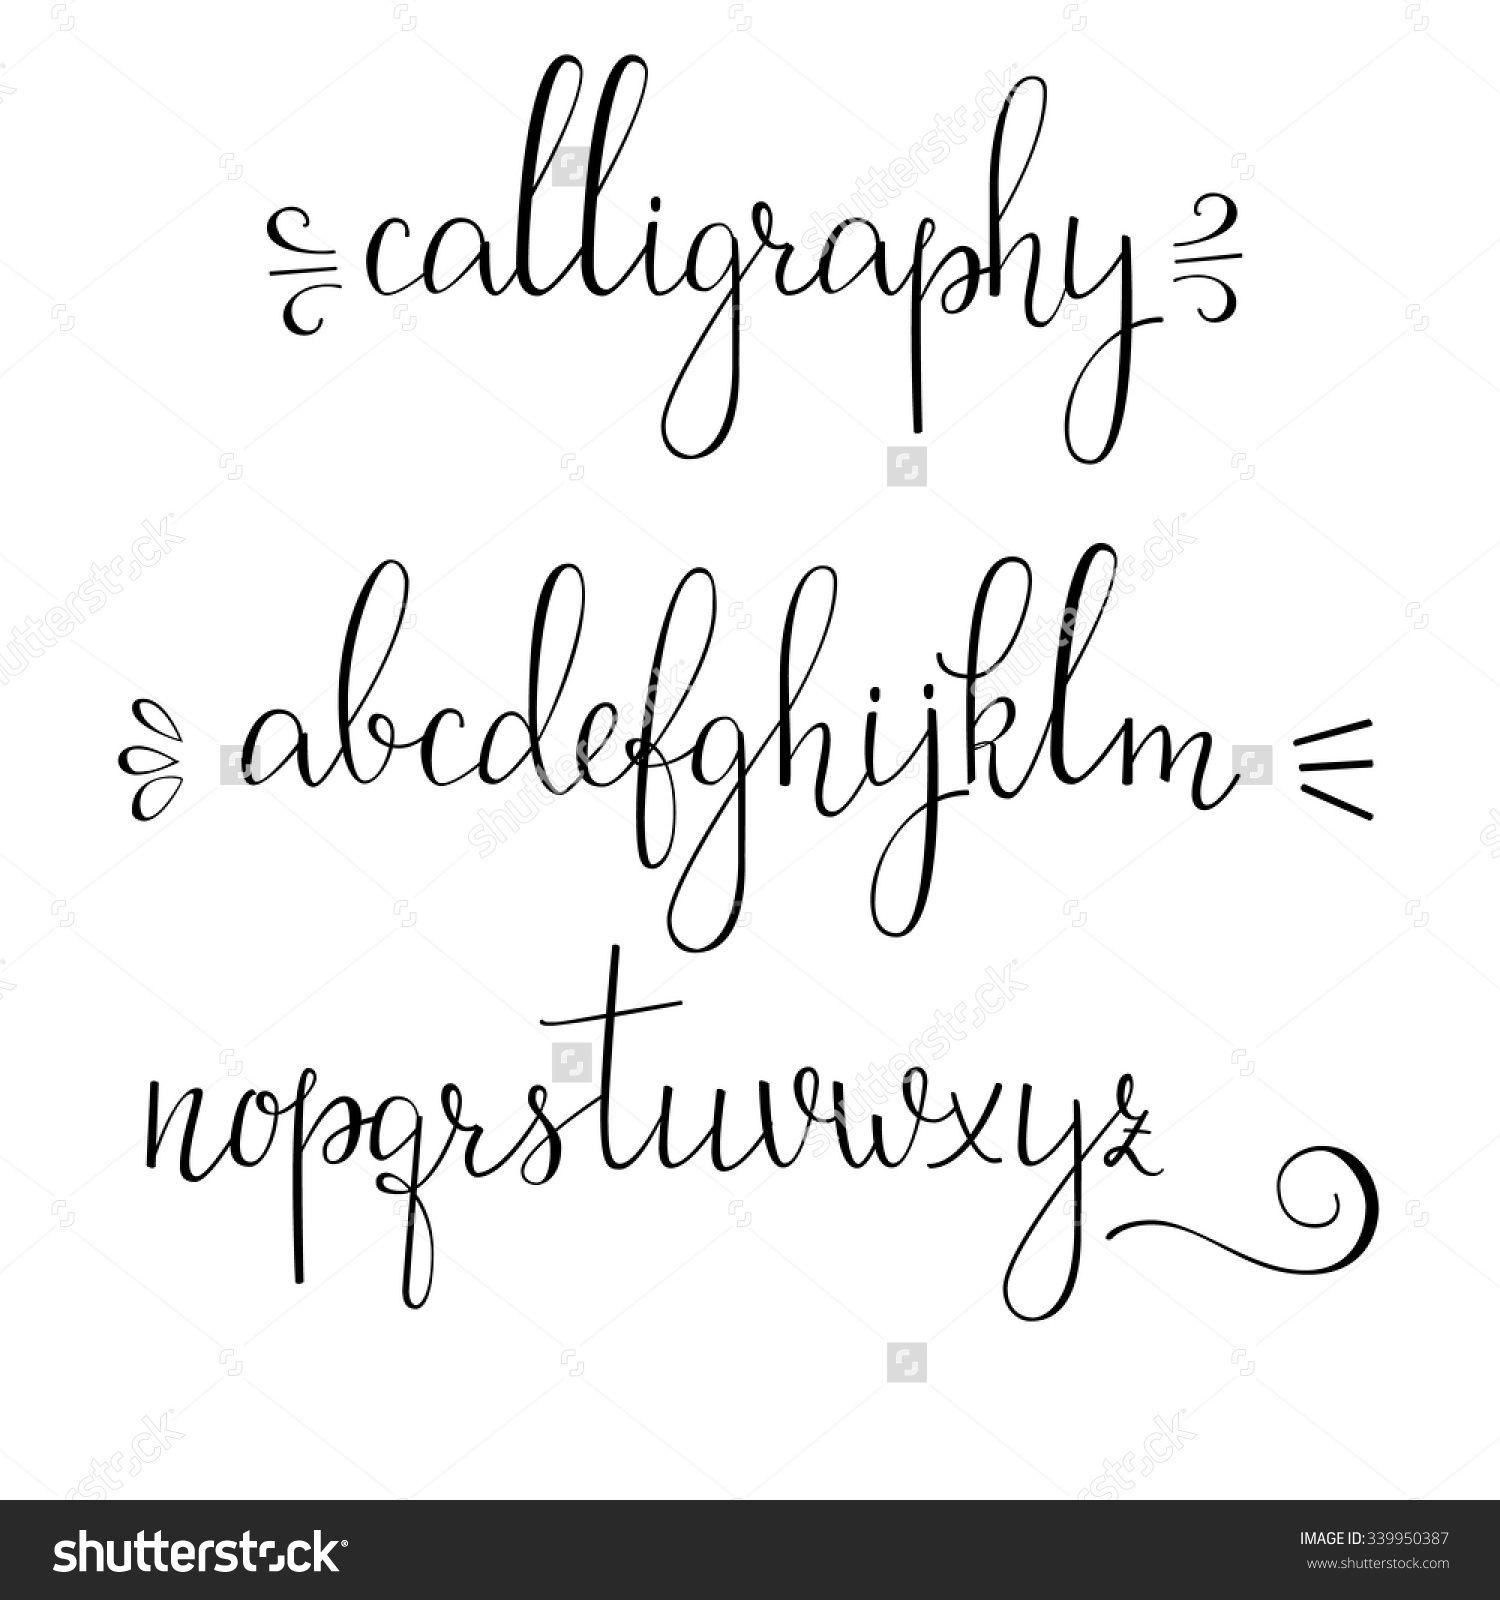 Handwritten Pointed Pen Ink Style Modern Calligraphy Cursive Font Calligraphy Alphabet Modern Calligraphy Alphabet Lettering Alphabet Cursive Fonts Alphabet